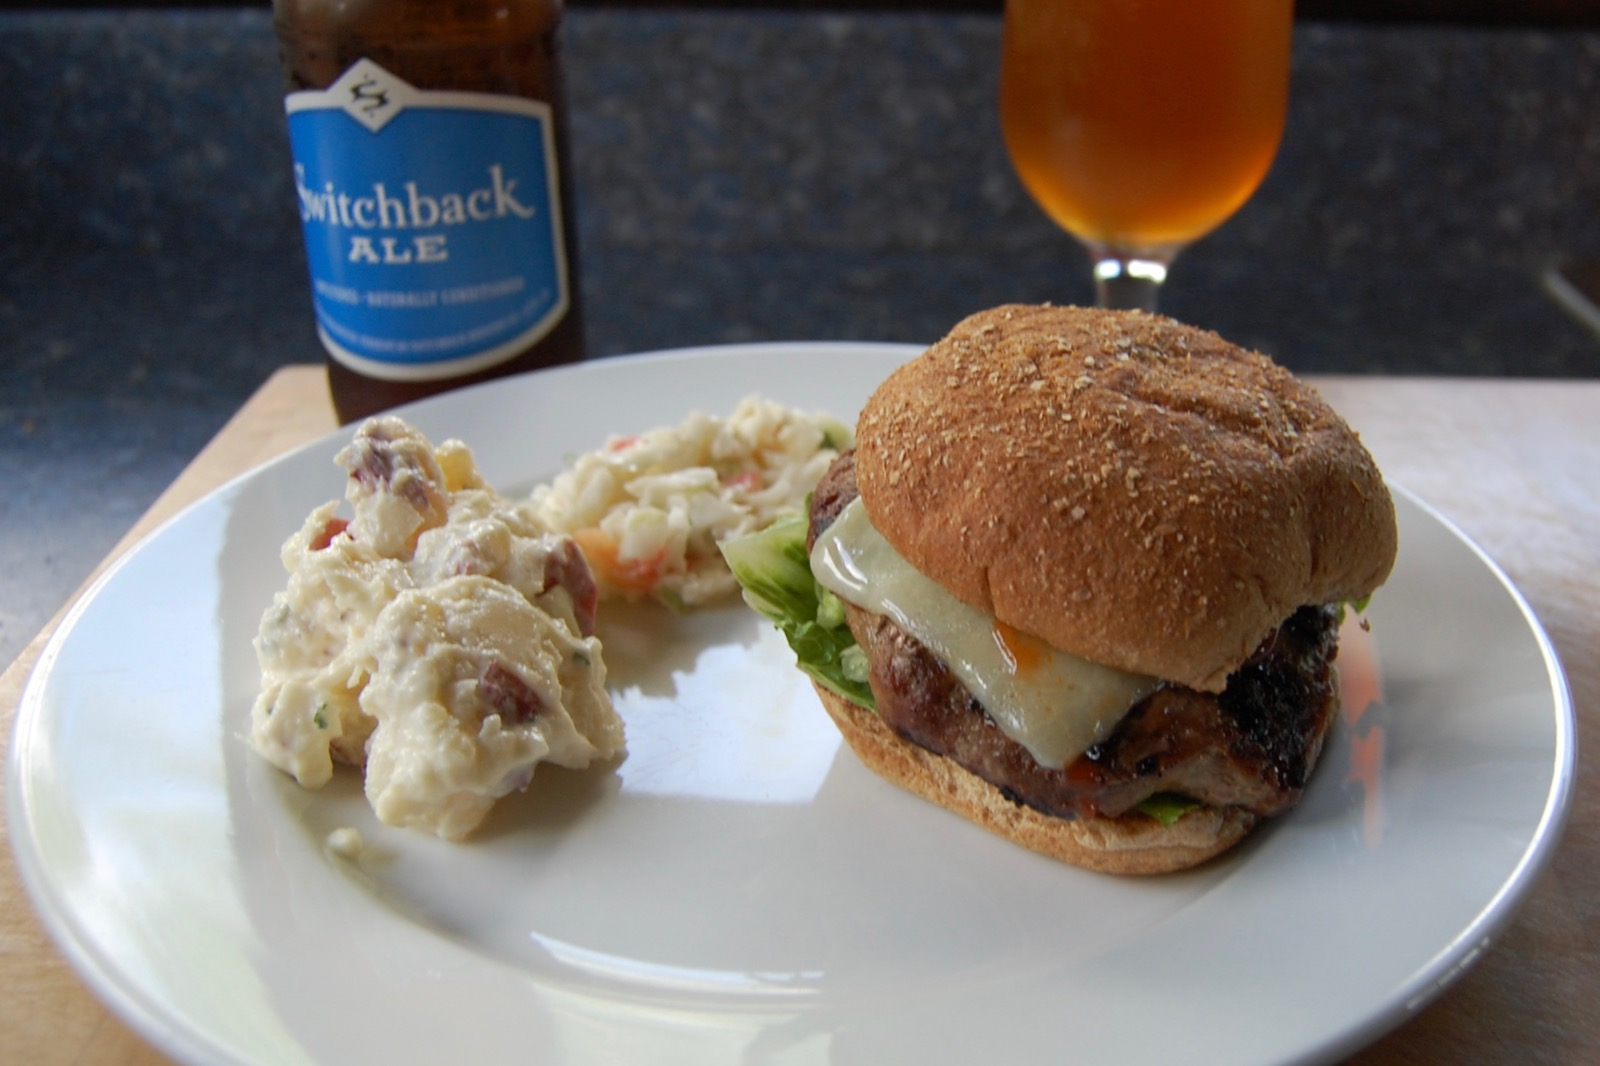 http://blog.rickk.com/food/2018/07/05/ate.2018.07.04.d.jpg